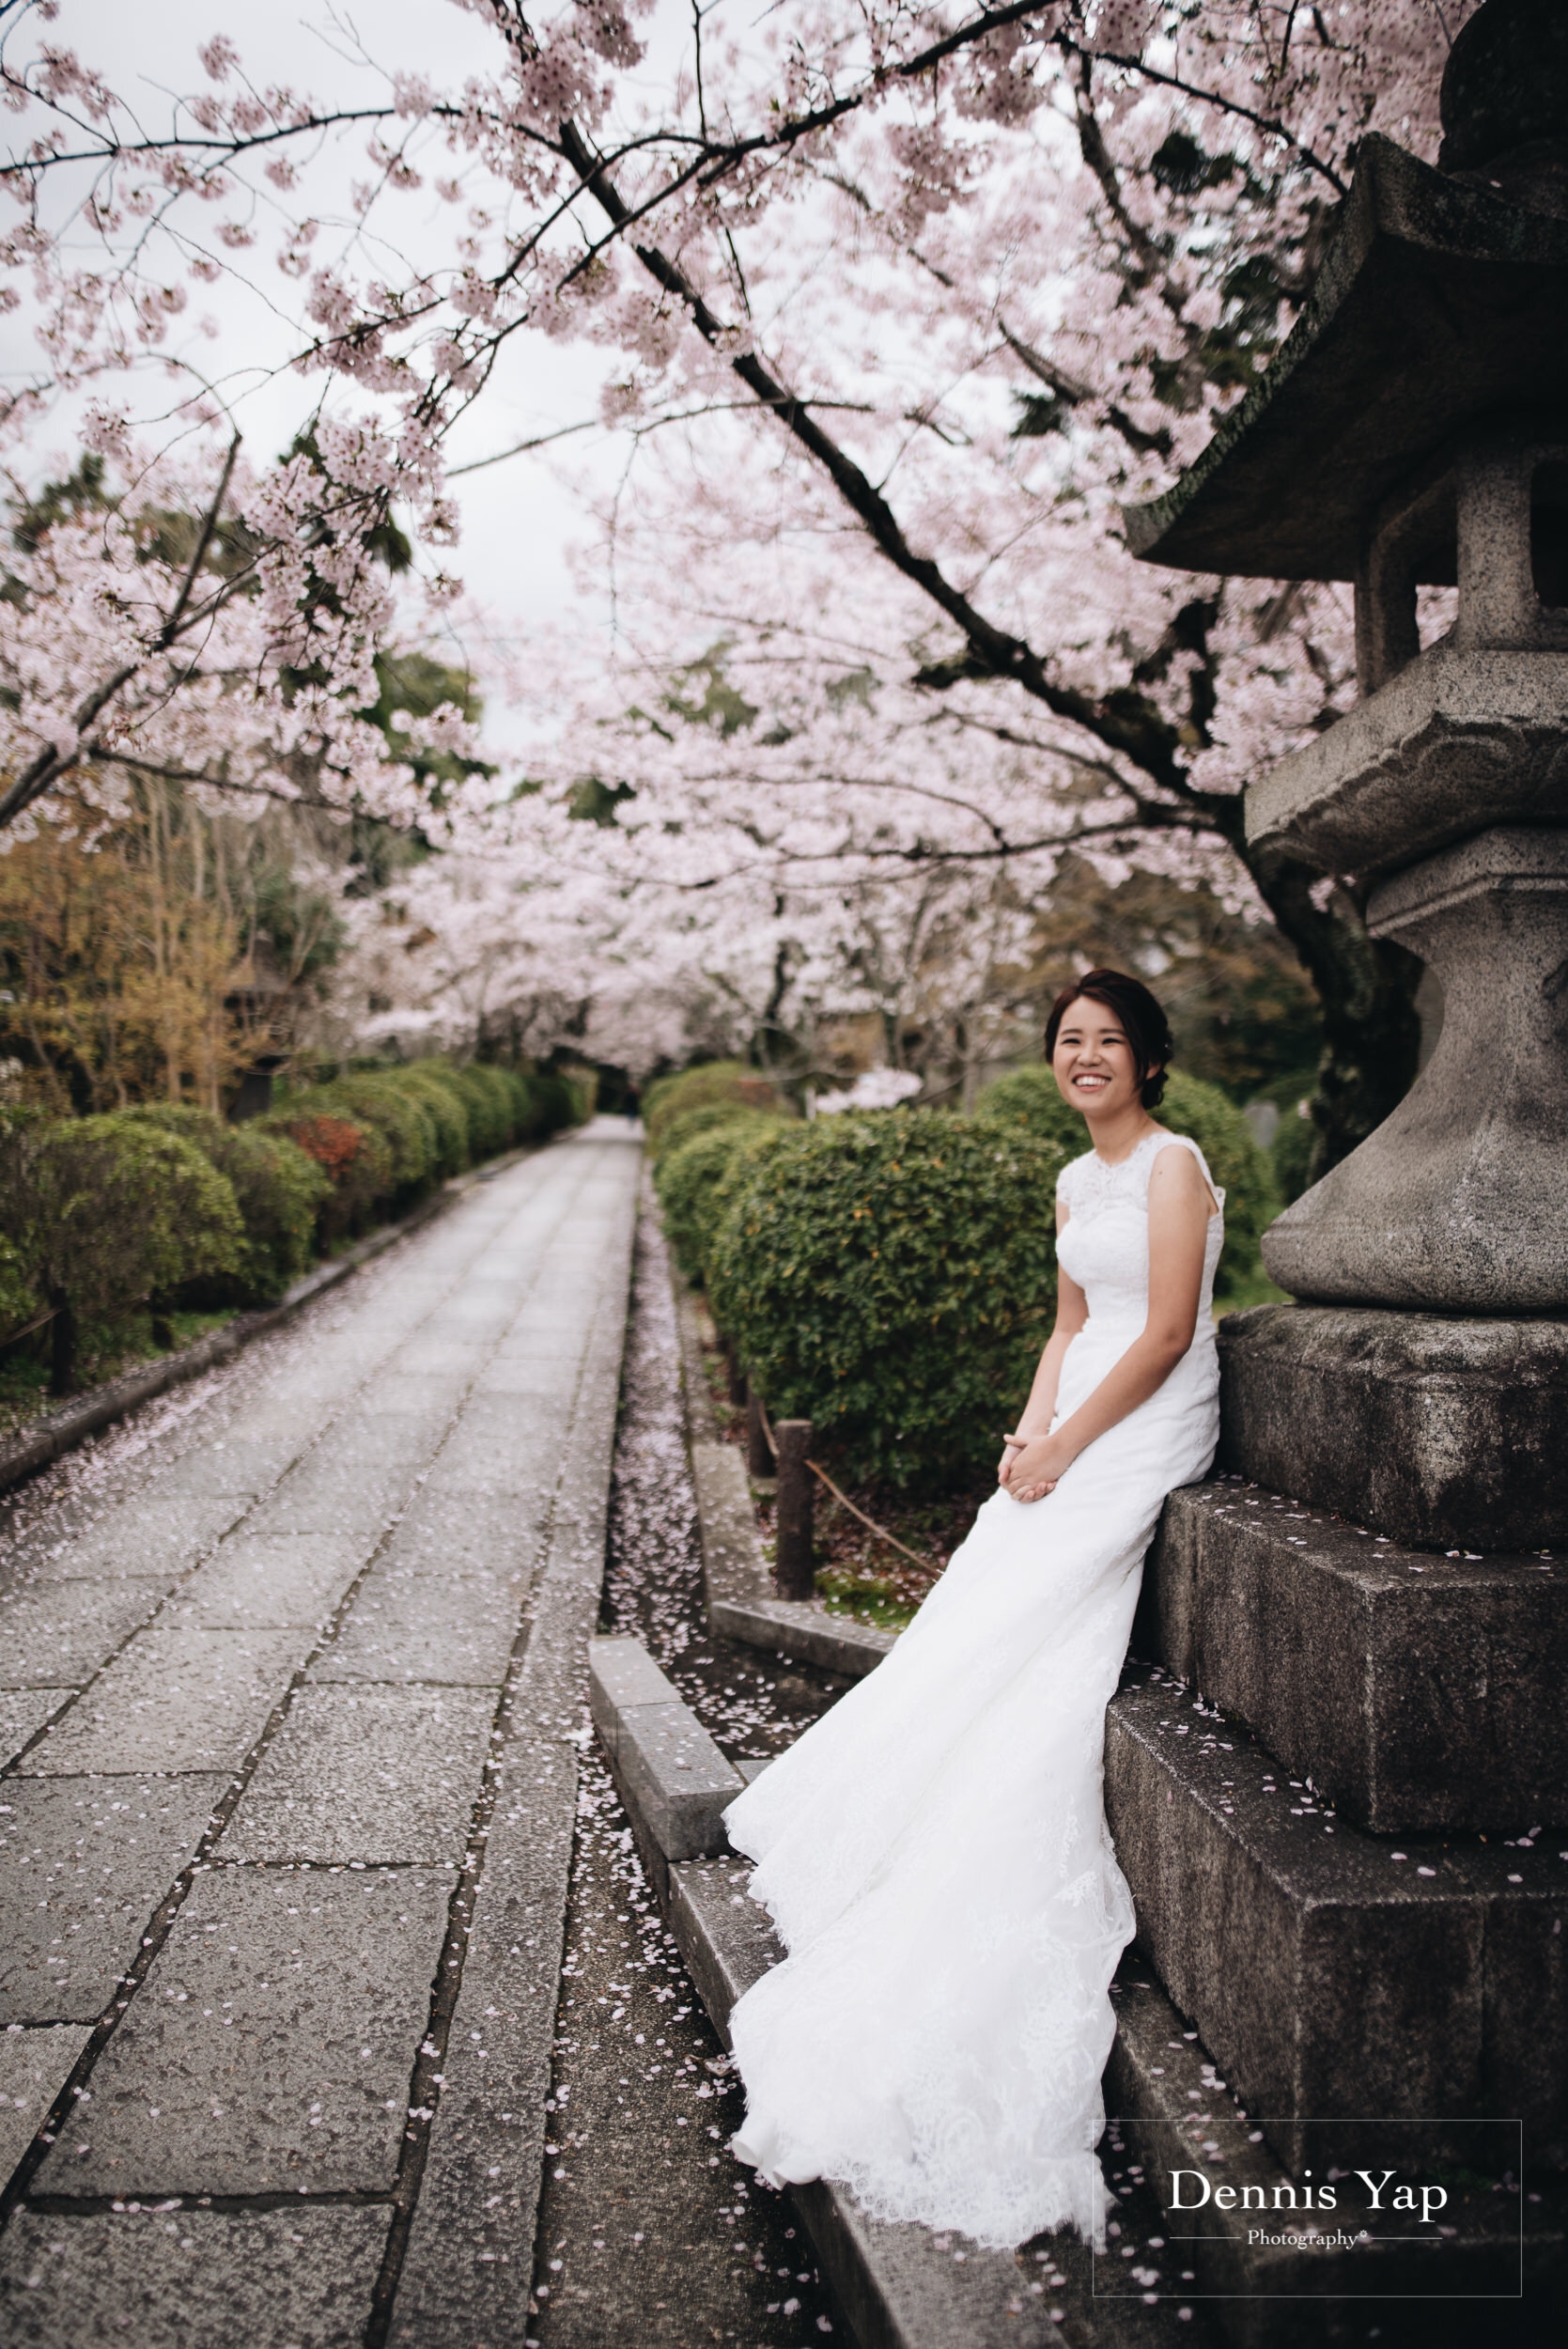 Ivan Glory pre wedding kyoto japan dennis yap photography malaysia top wedding photographer beloved-112.jpg